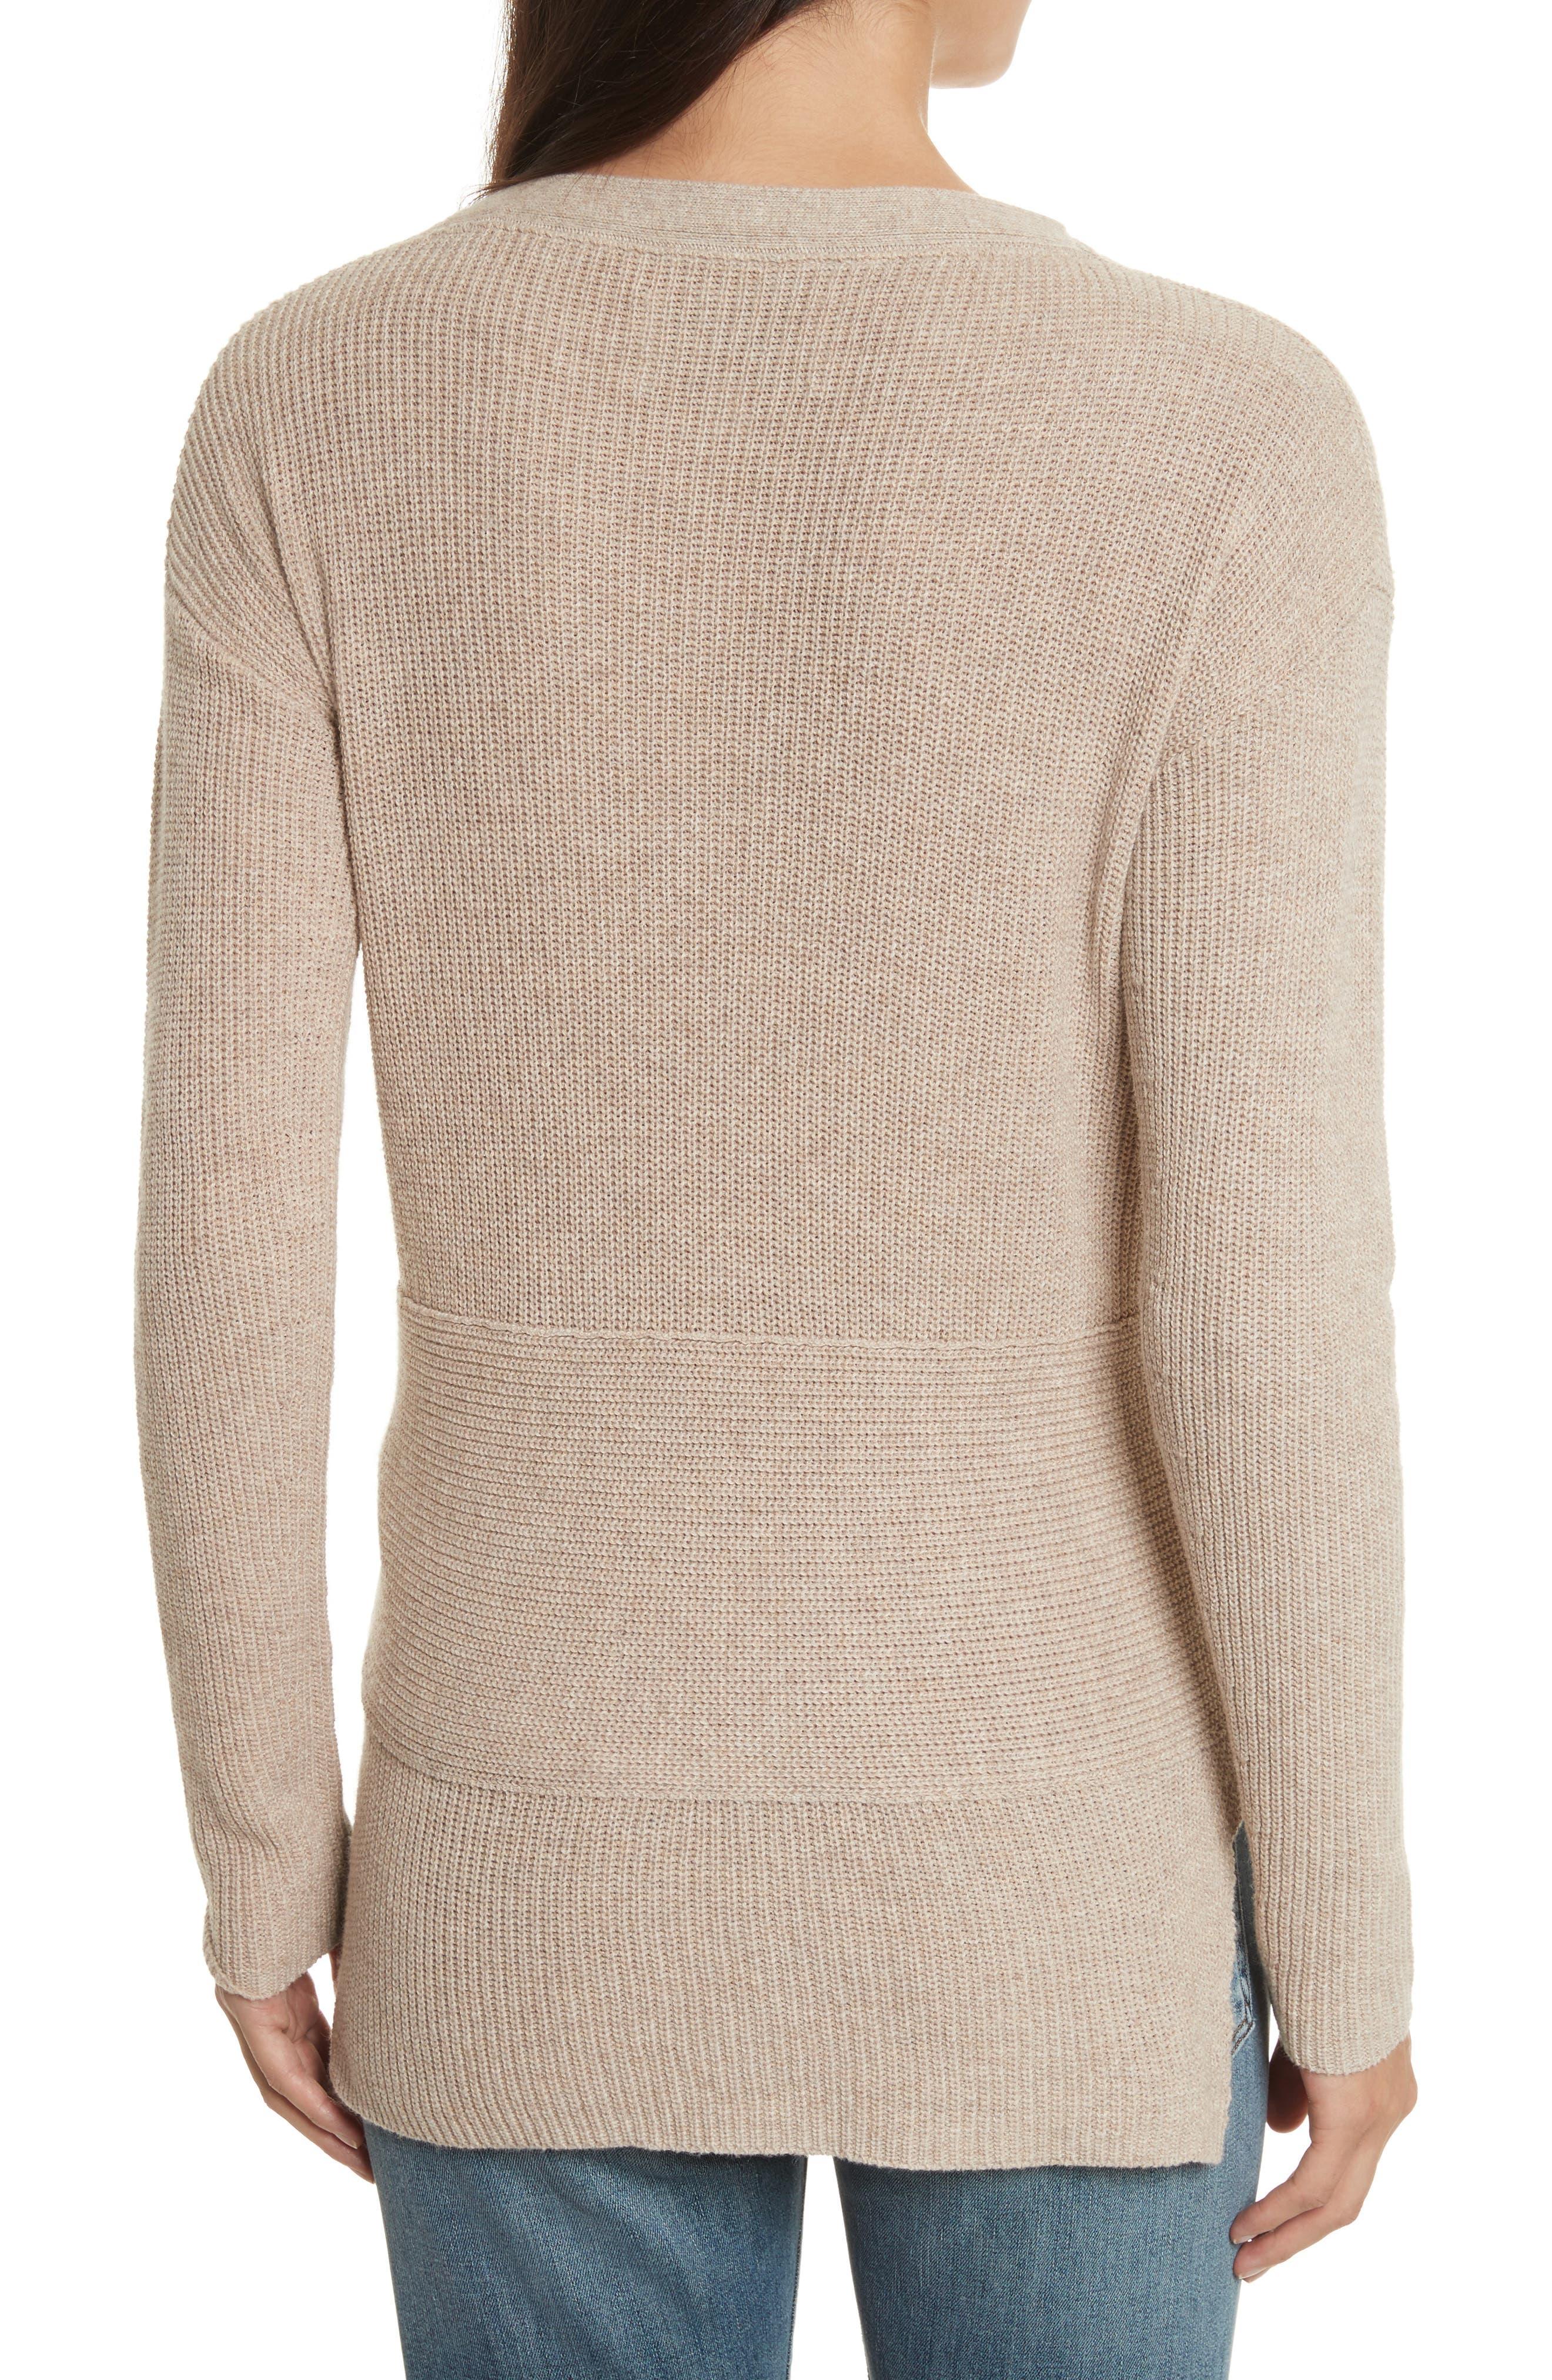 Greys Wrap Sweater,                             Alternate thumbnail 2, color,                             270